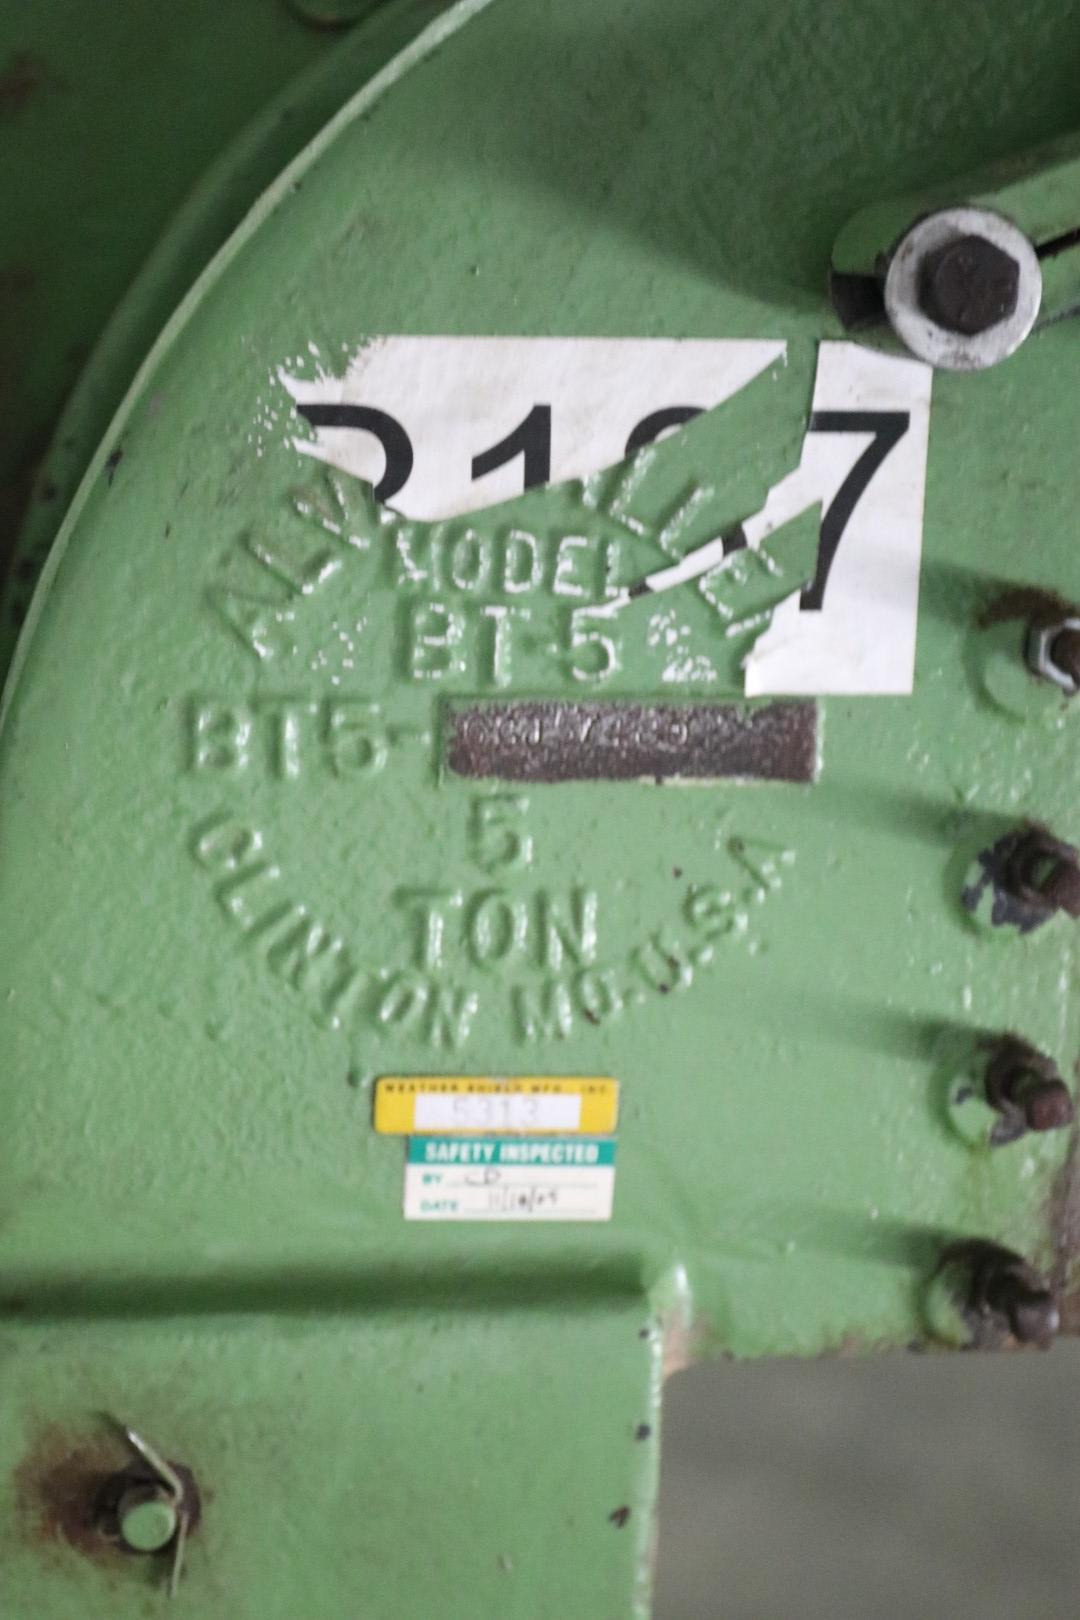 5cfcc1972d5e8972ace3c90e609f0f58-4d941359b25a528fbc25cf4ffaef9839.jpeg